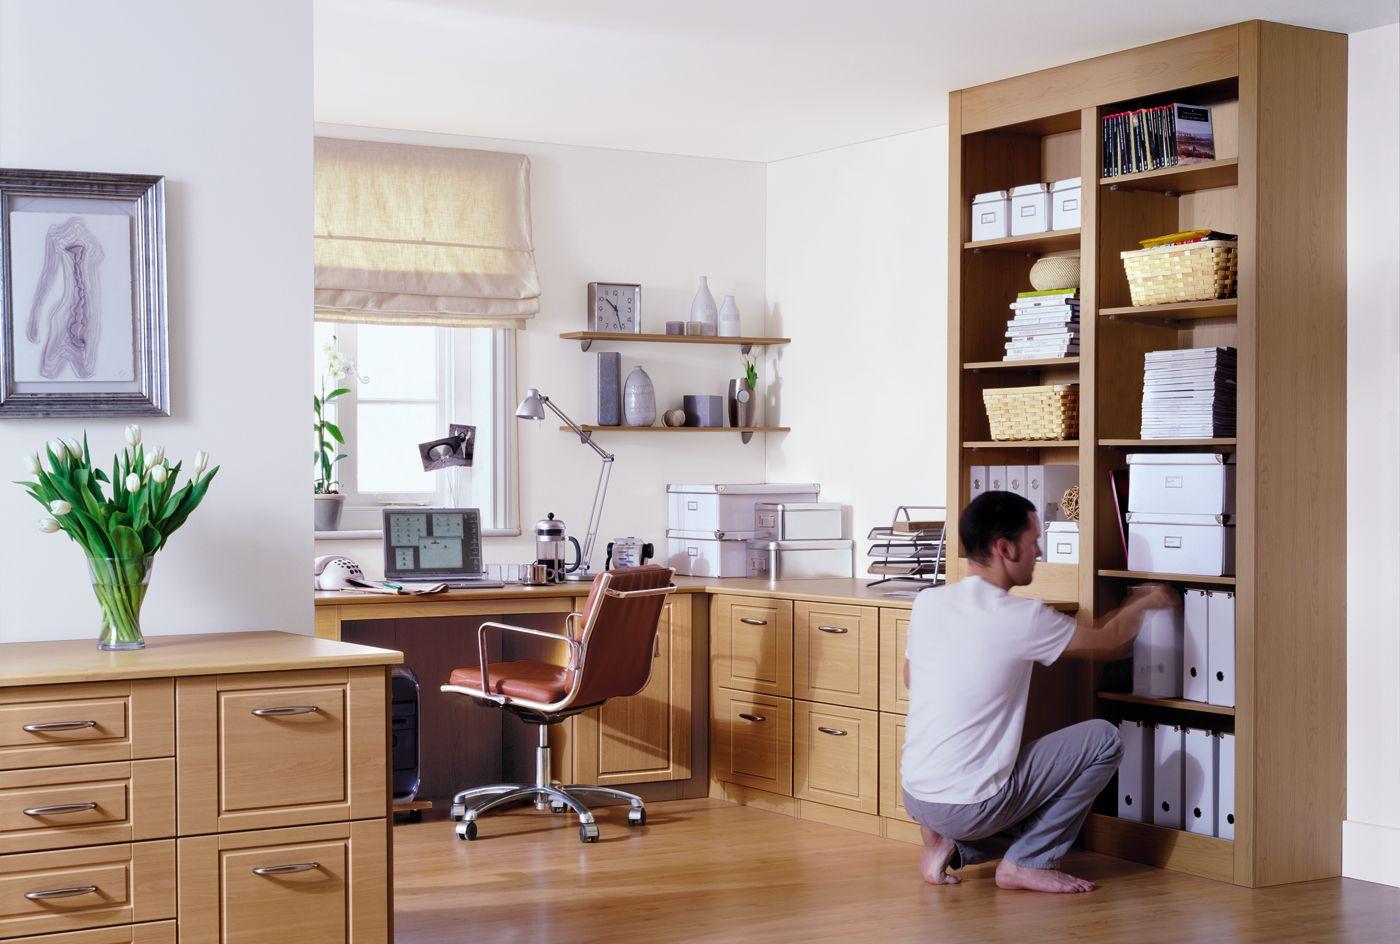 Büro Möbel Eiche Büro Möbel Online | BüroMöbel | Pinterest ...